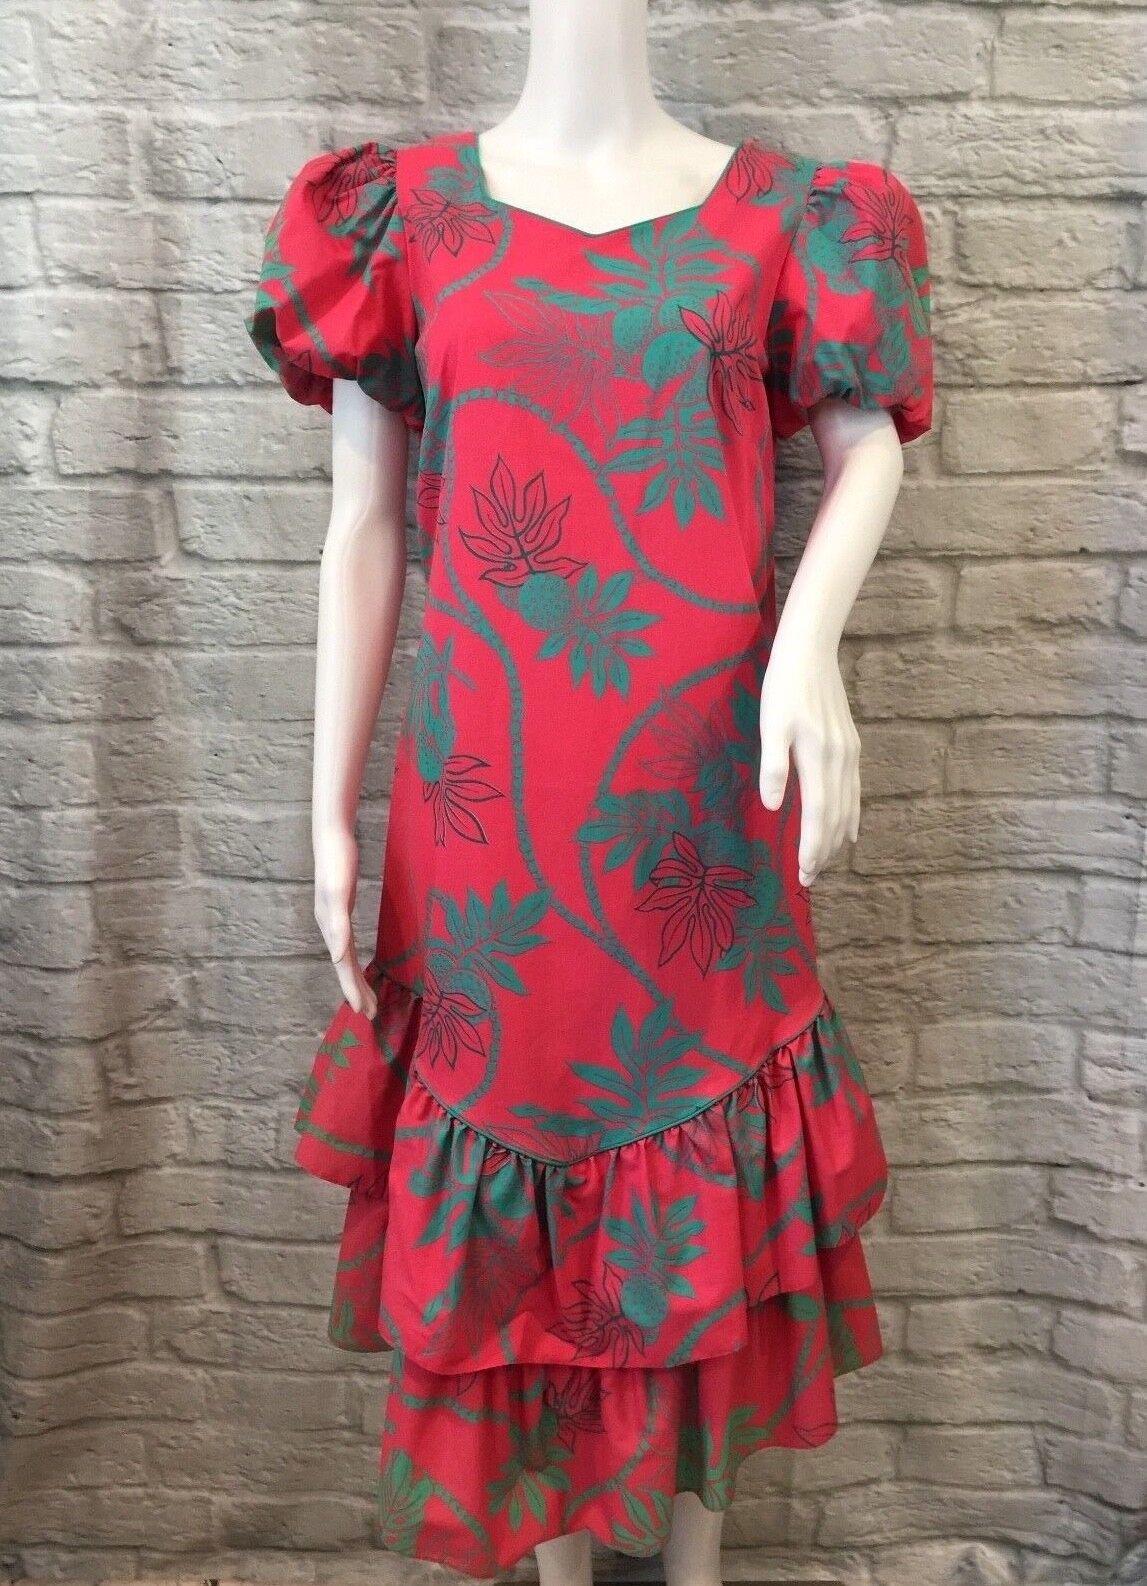 Hilo Hattie Sz 8 Hawaiian Floral Ruffle Puffy Sleeve CRISP Fabric Dress